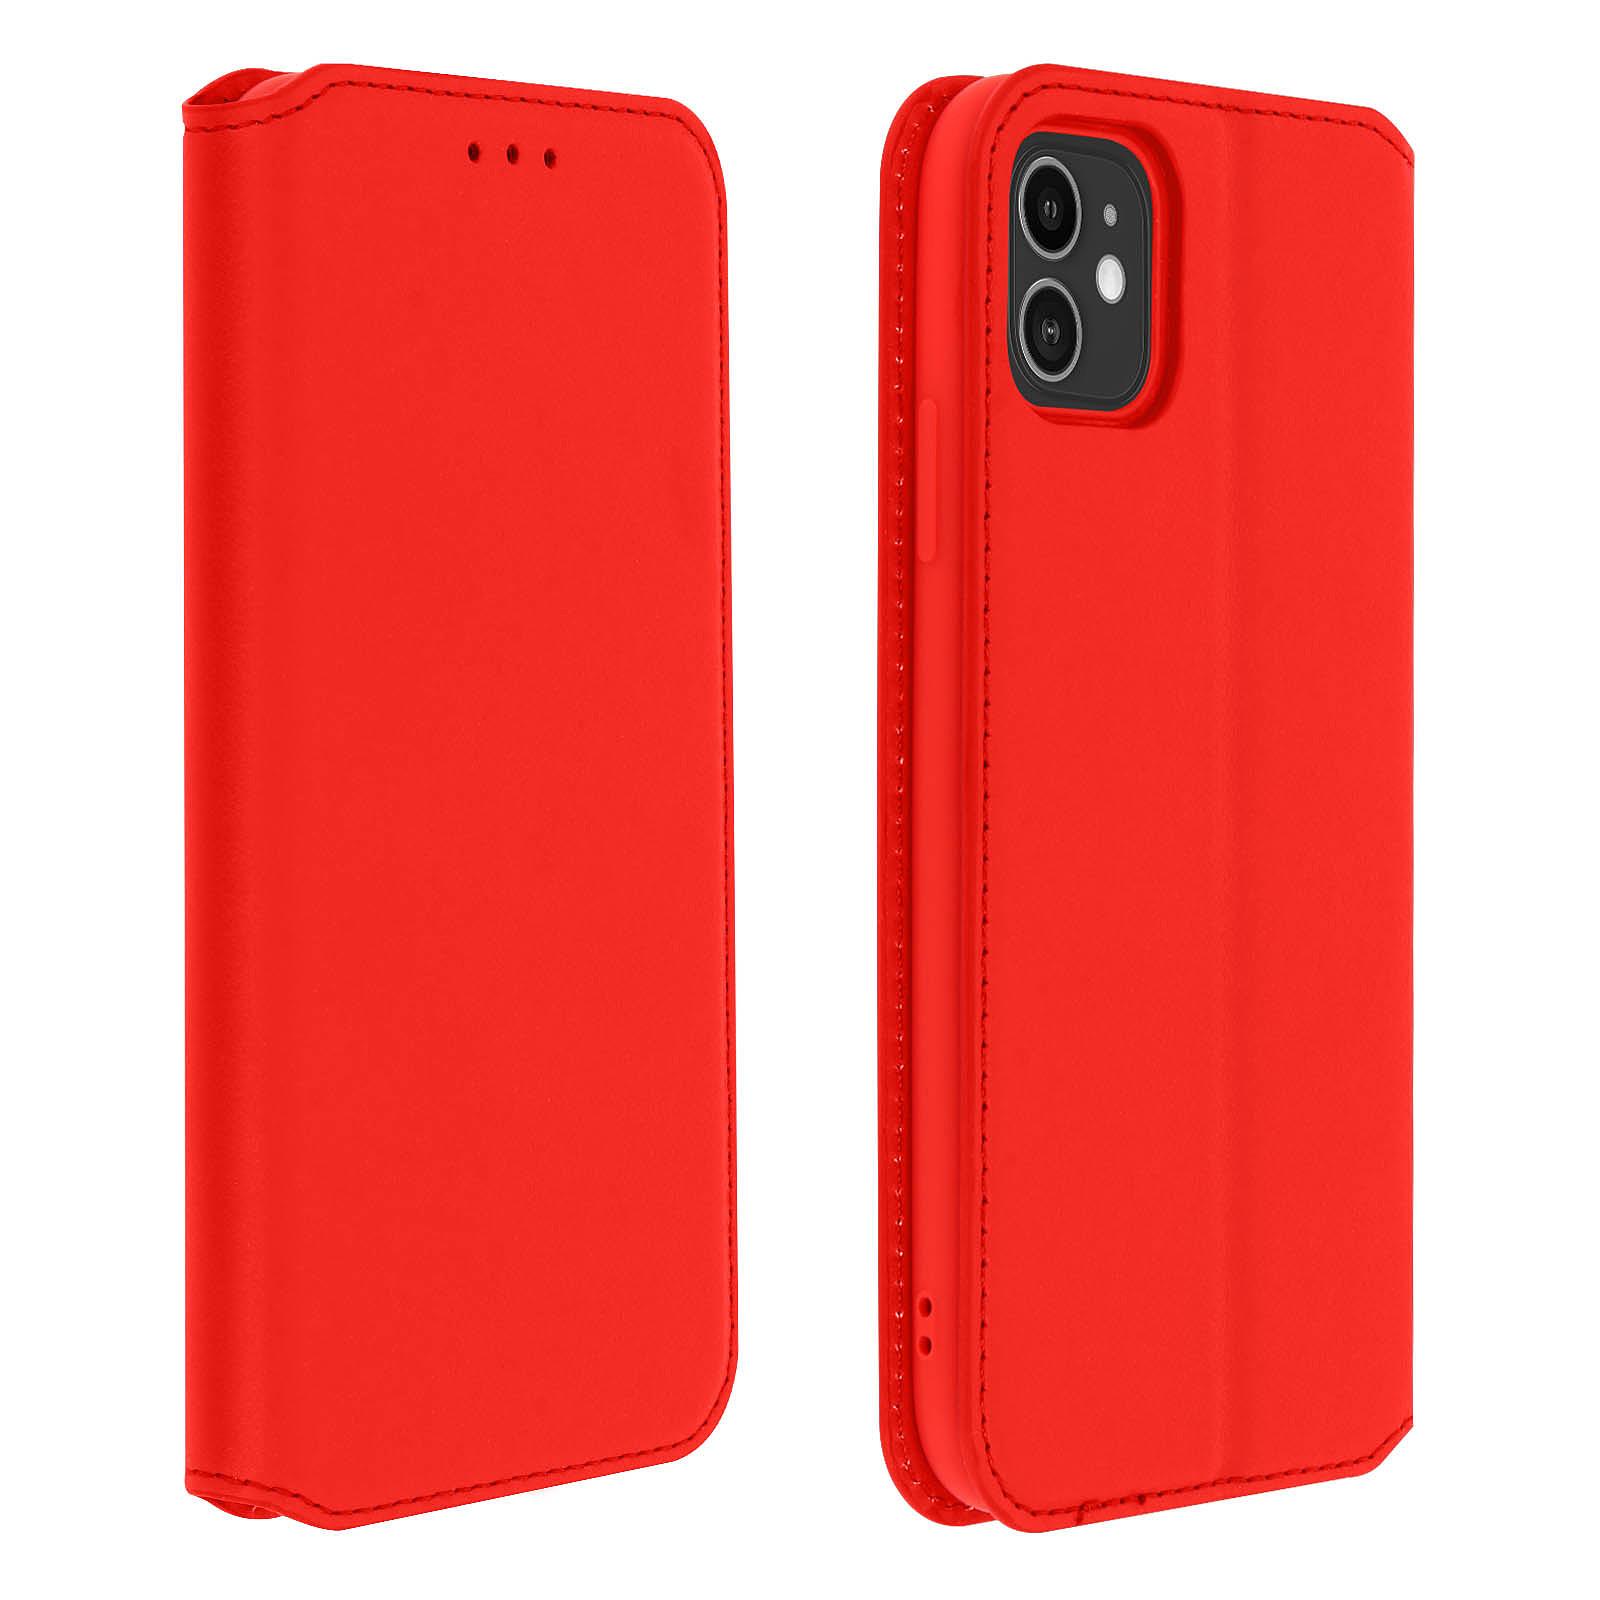 Avizar Etui folio Rouge Éco-cuir pour Apple iPhone 11